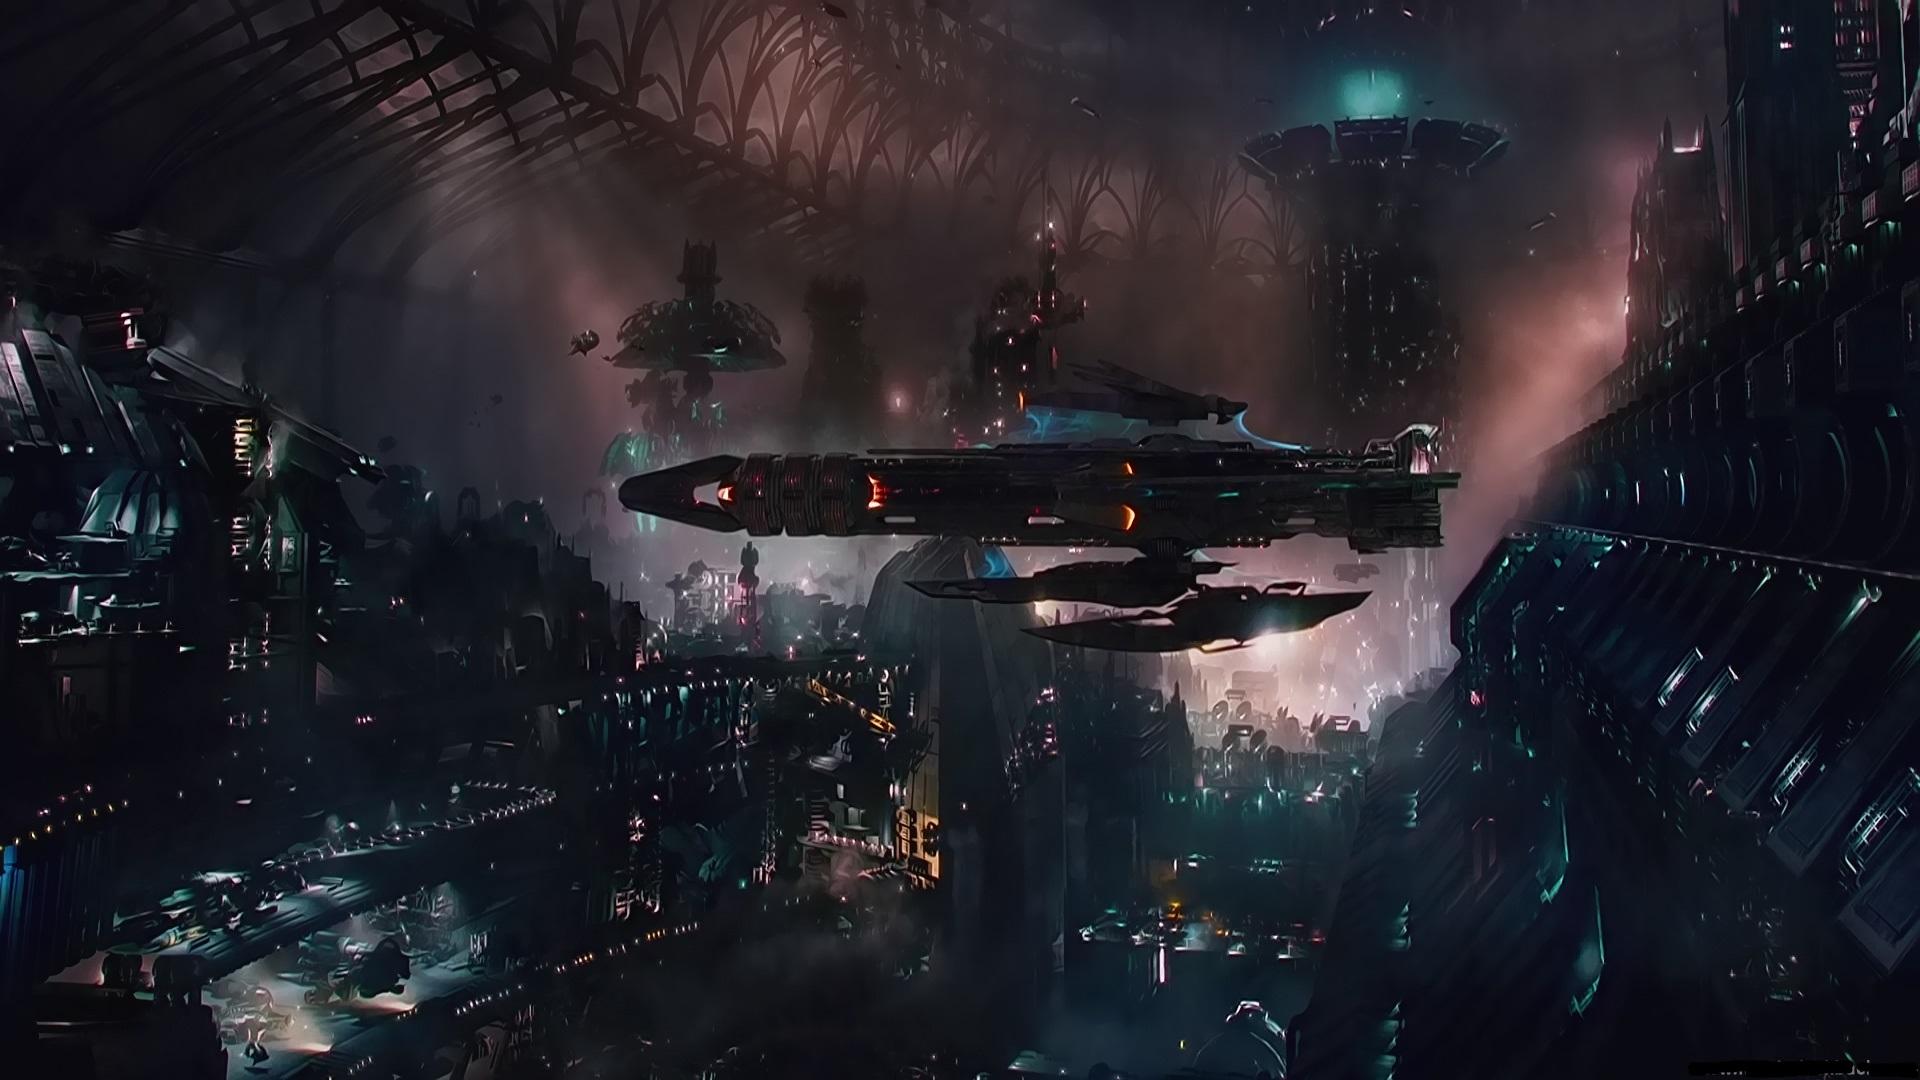 jupiter ascending movie wallpaper space city image dark